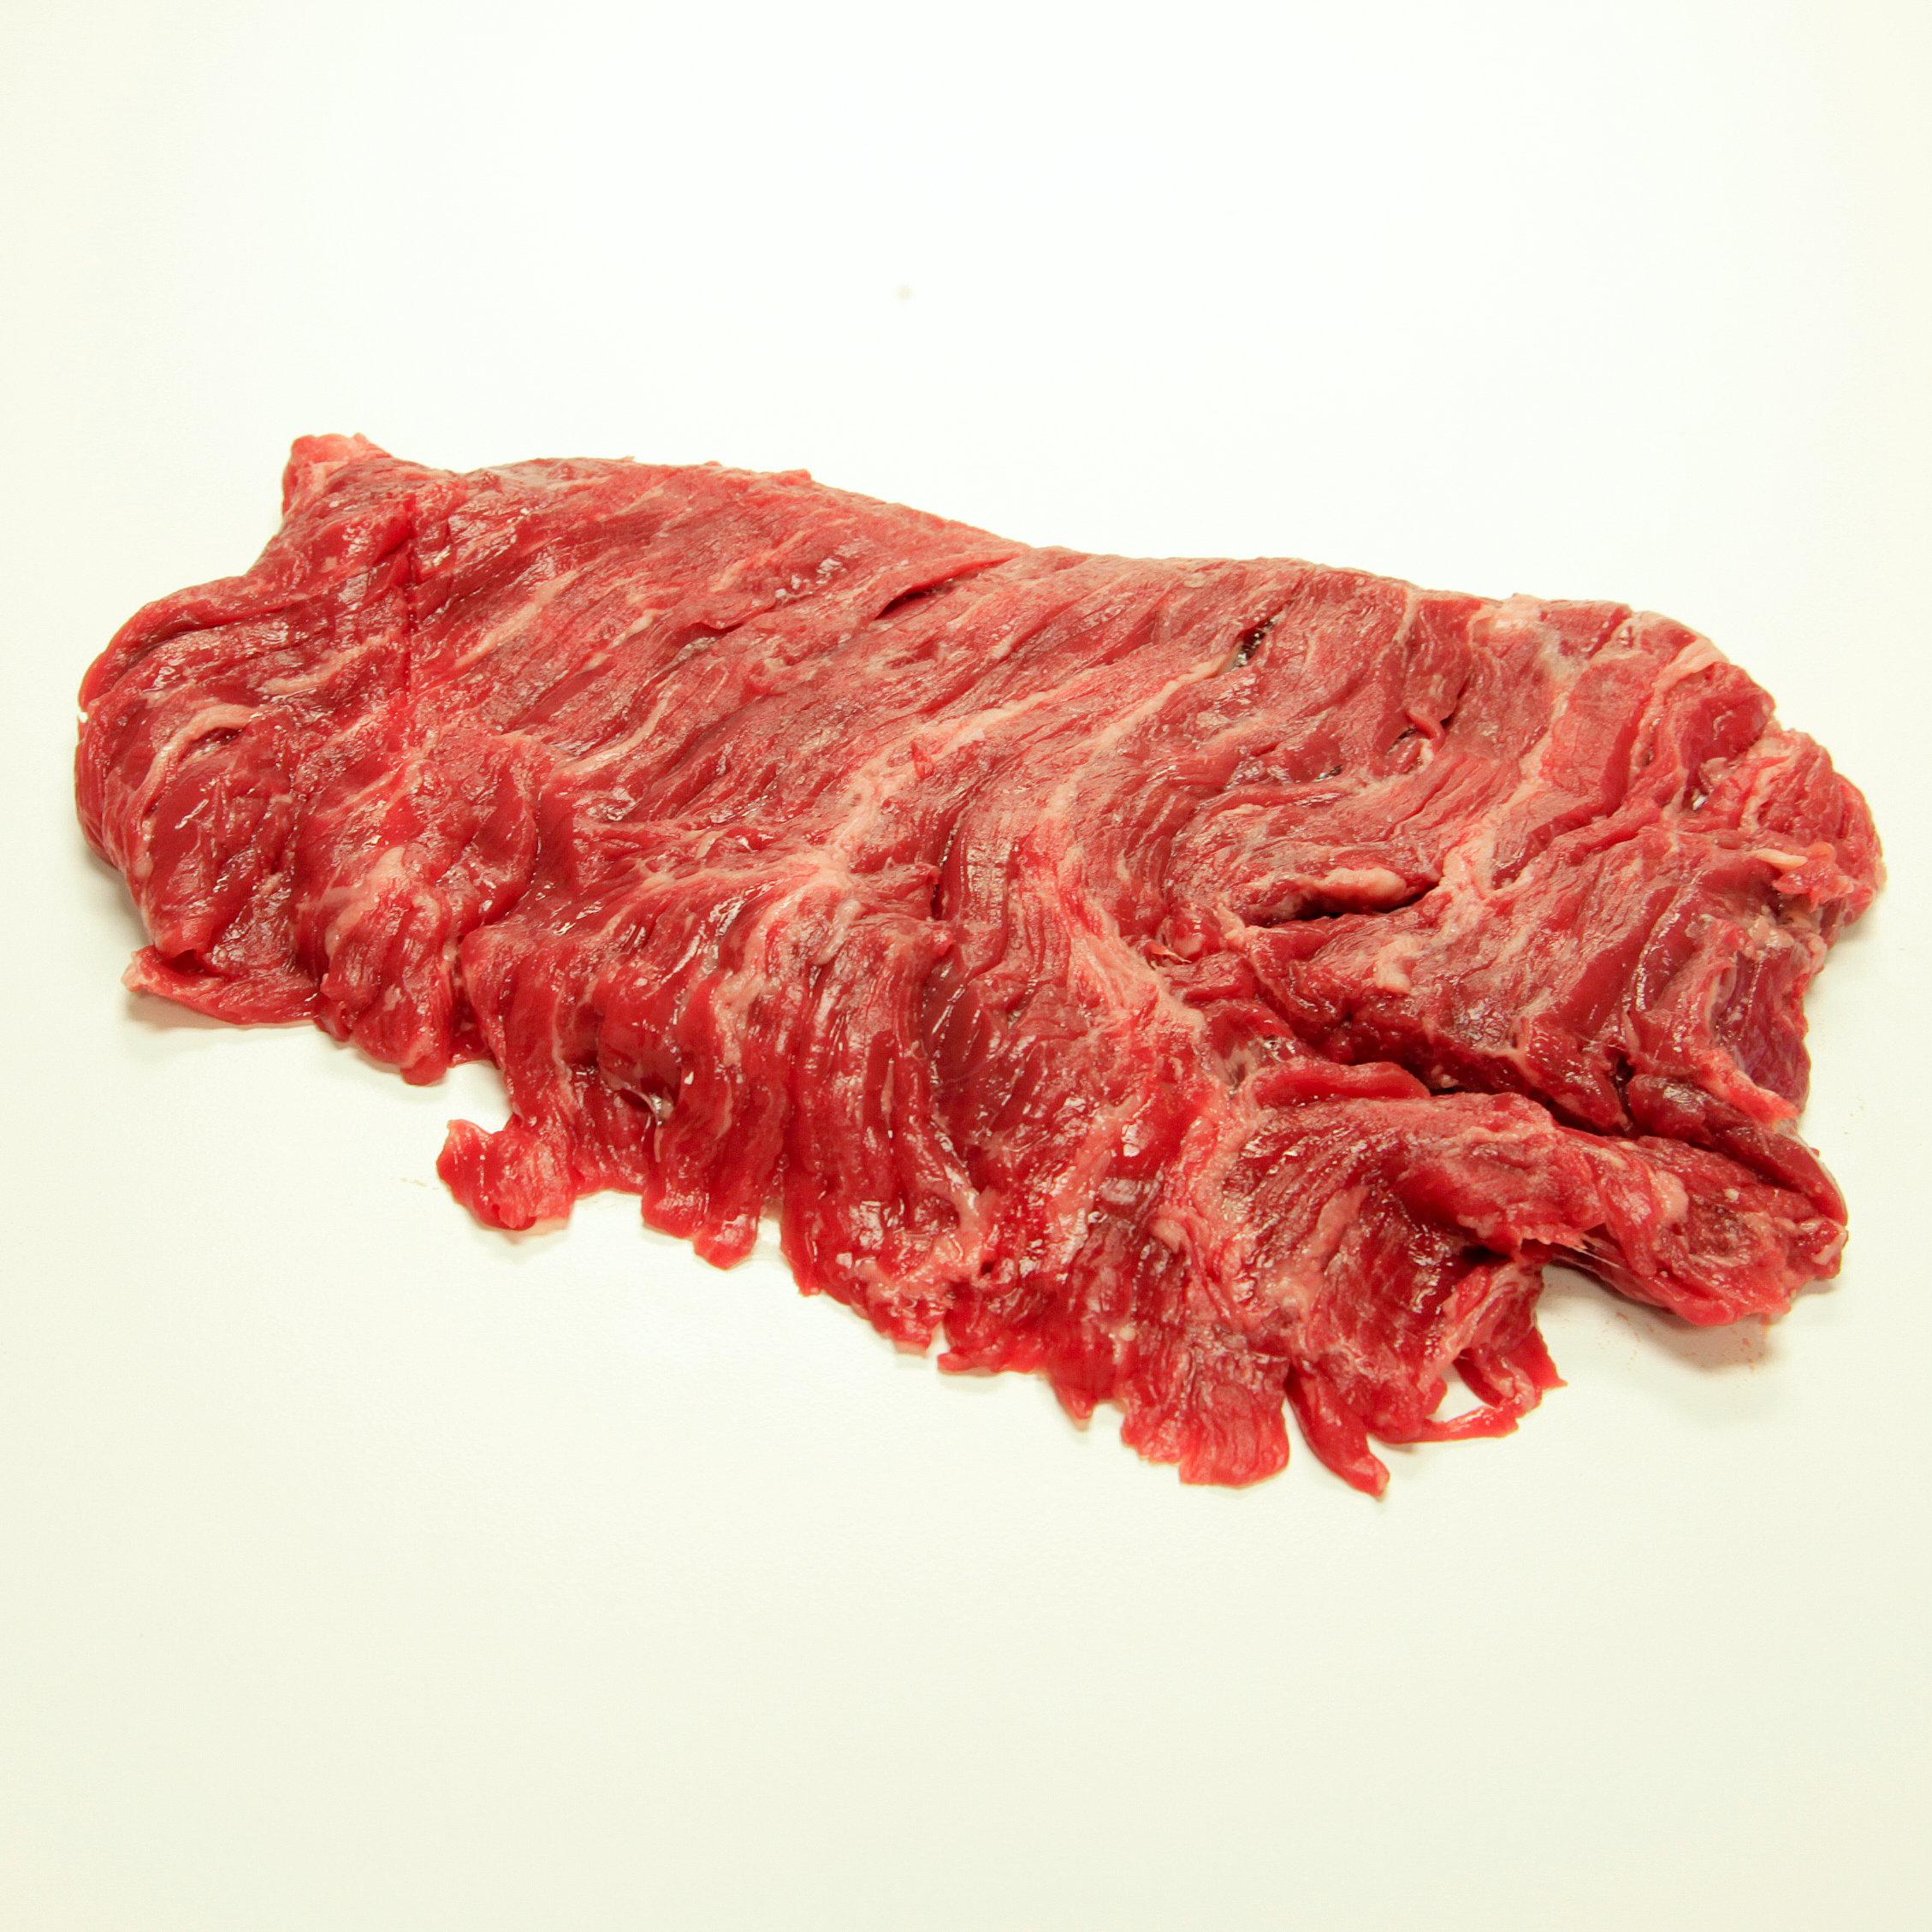 Harris Ranch, Black Angus Skirt Steak, 1 lb. 00094